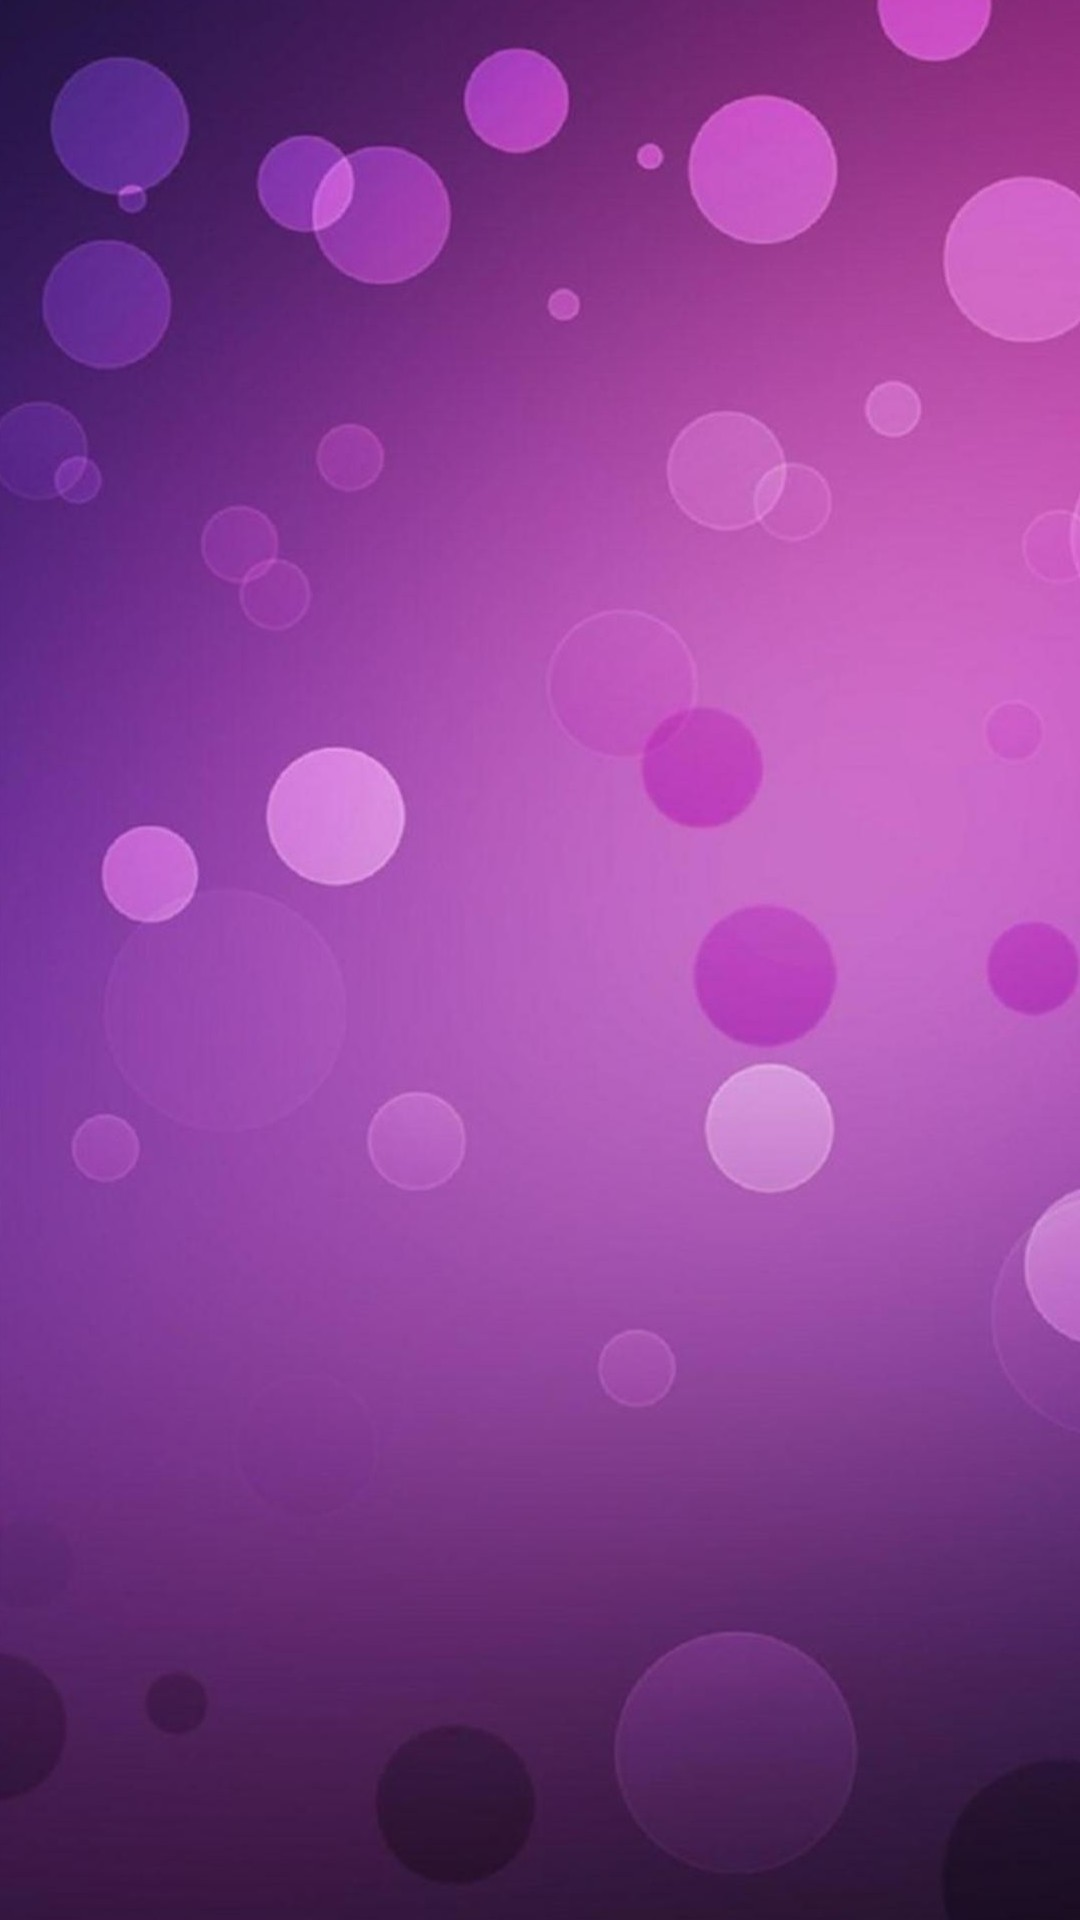 Colorful-Samsung-Galaxy-Note-wallpaper-wp5804670-1